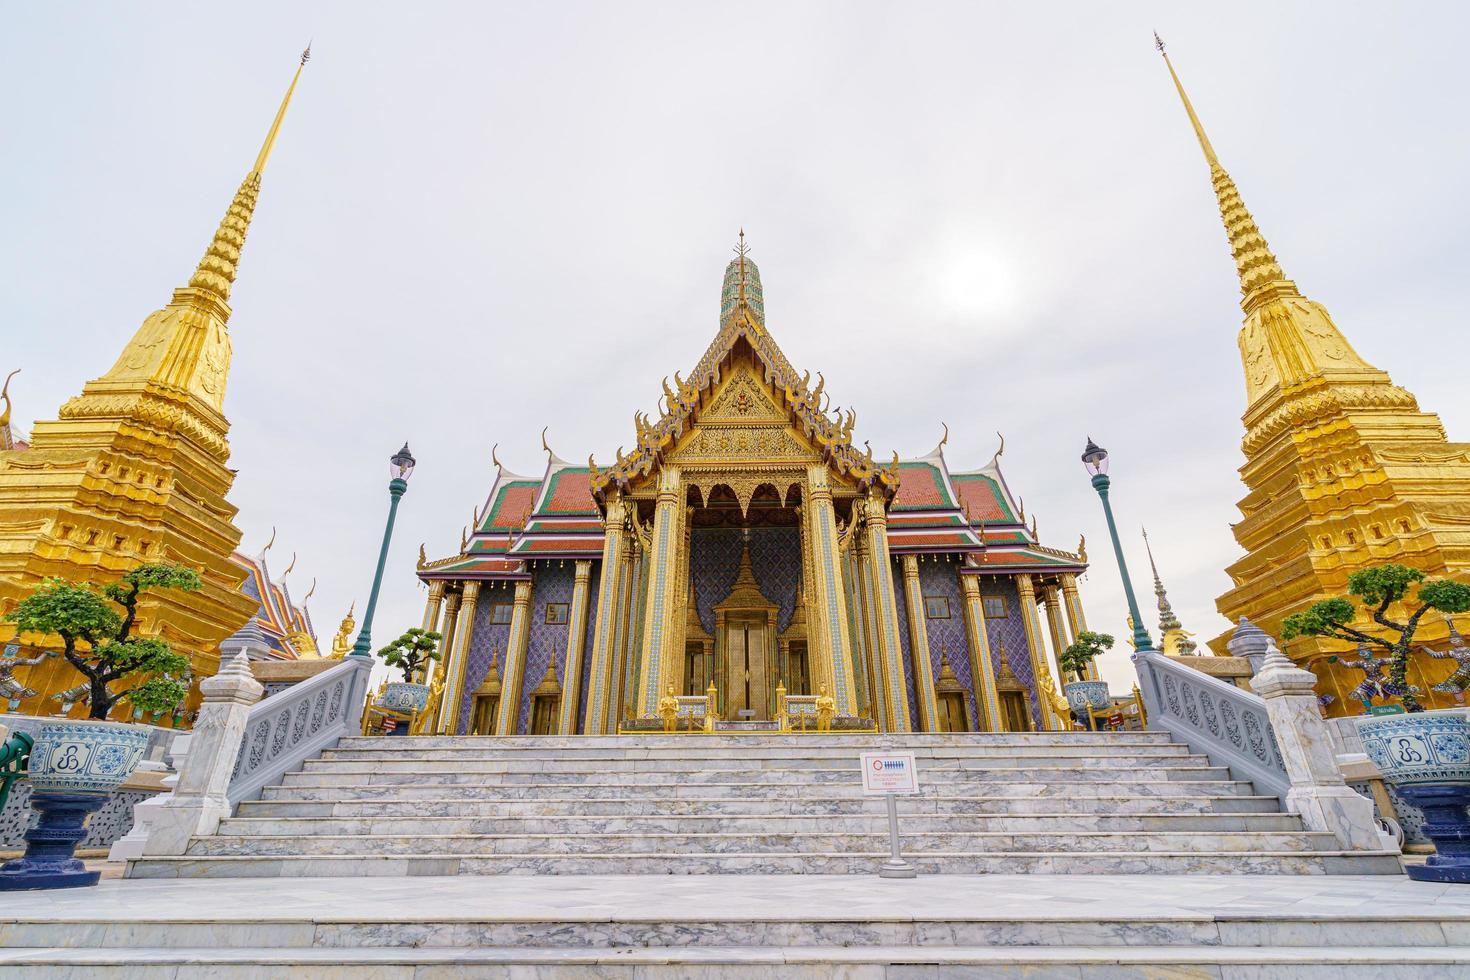 templo de wat phra kaew en tailandia foto